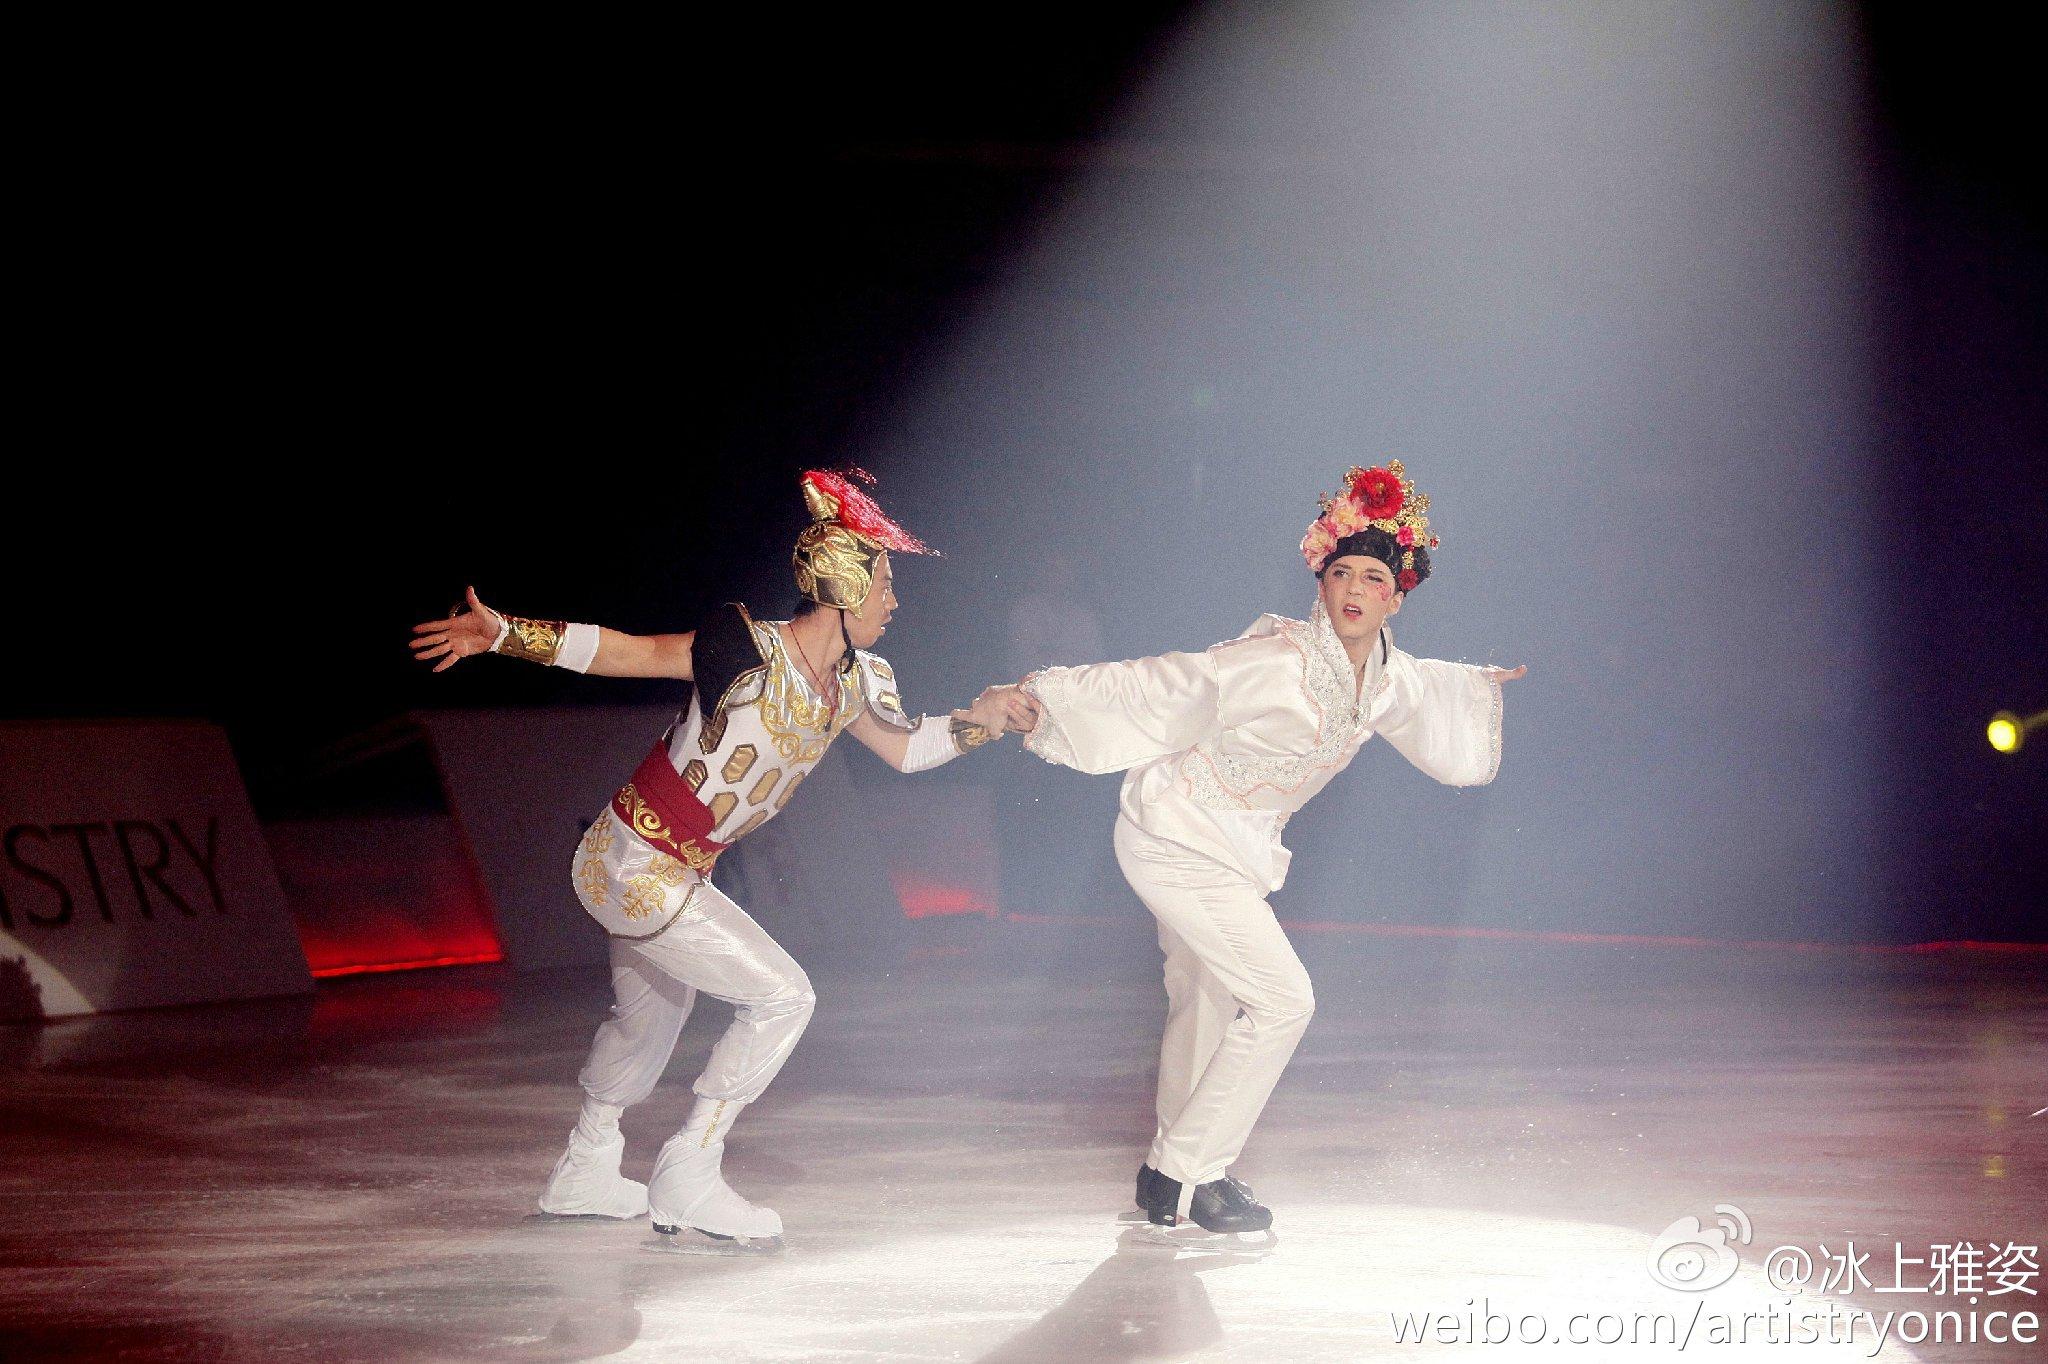 Ледовые шоу - 3  - Страница 2 7da576f2gw1etz5l9k3mbj21kw11wala